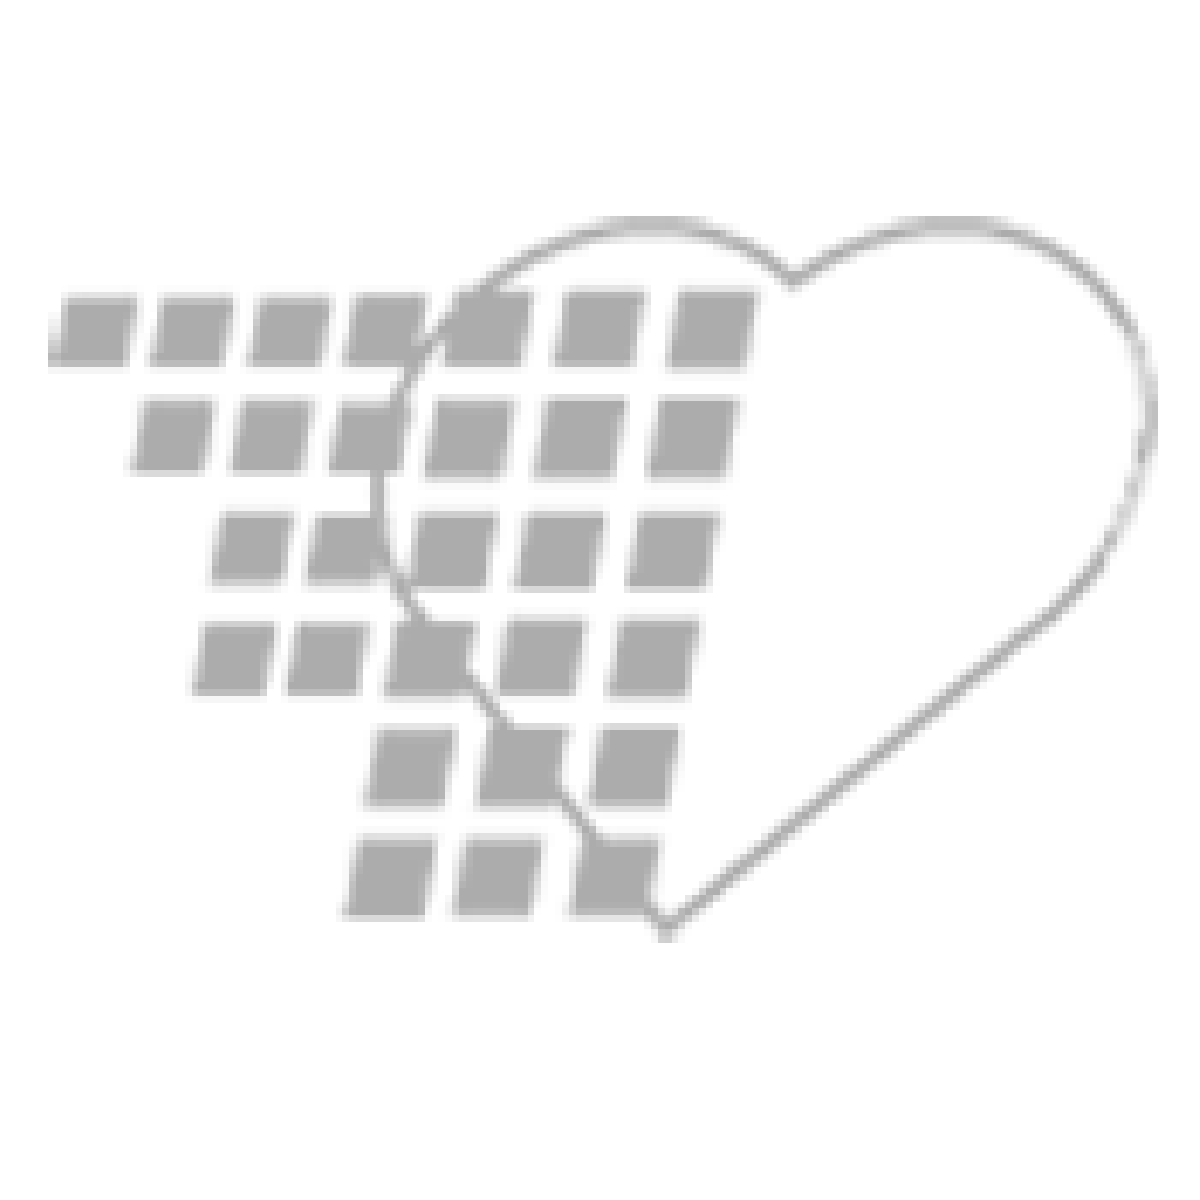 11-99-1130 - Nasco Life/form® 500 mL Fluid Supply Bag